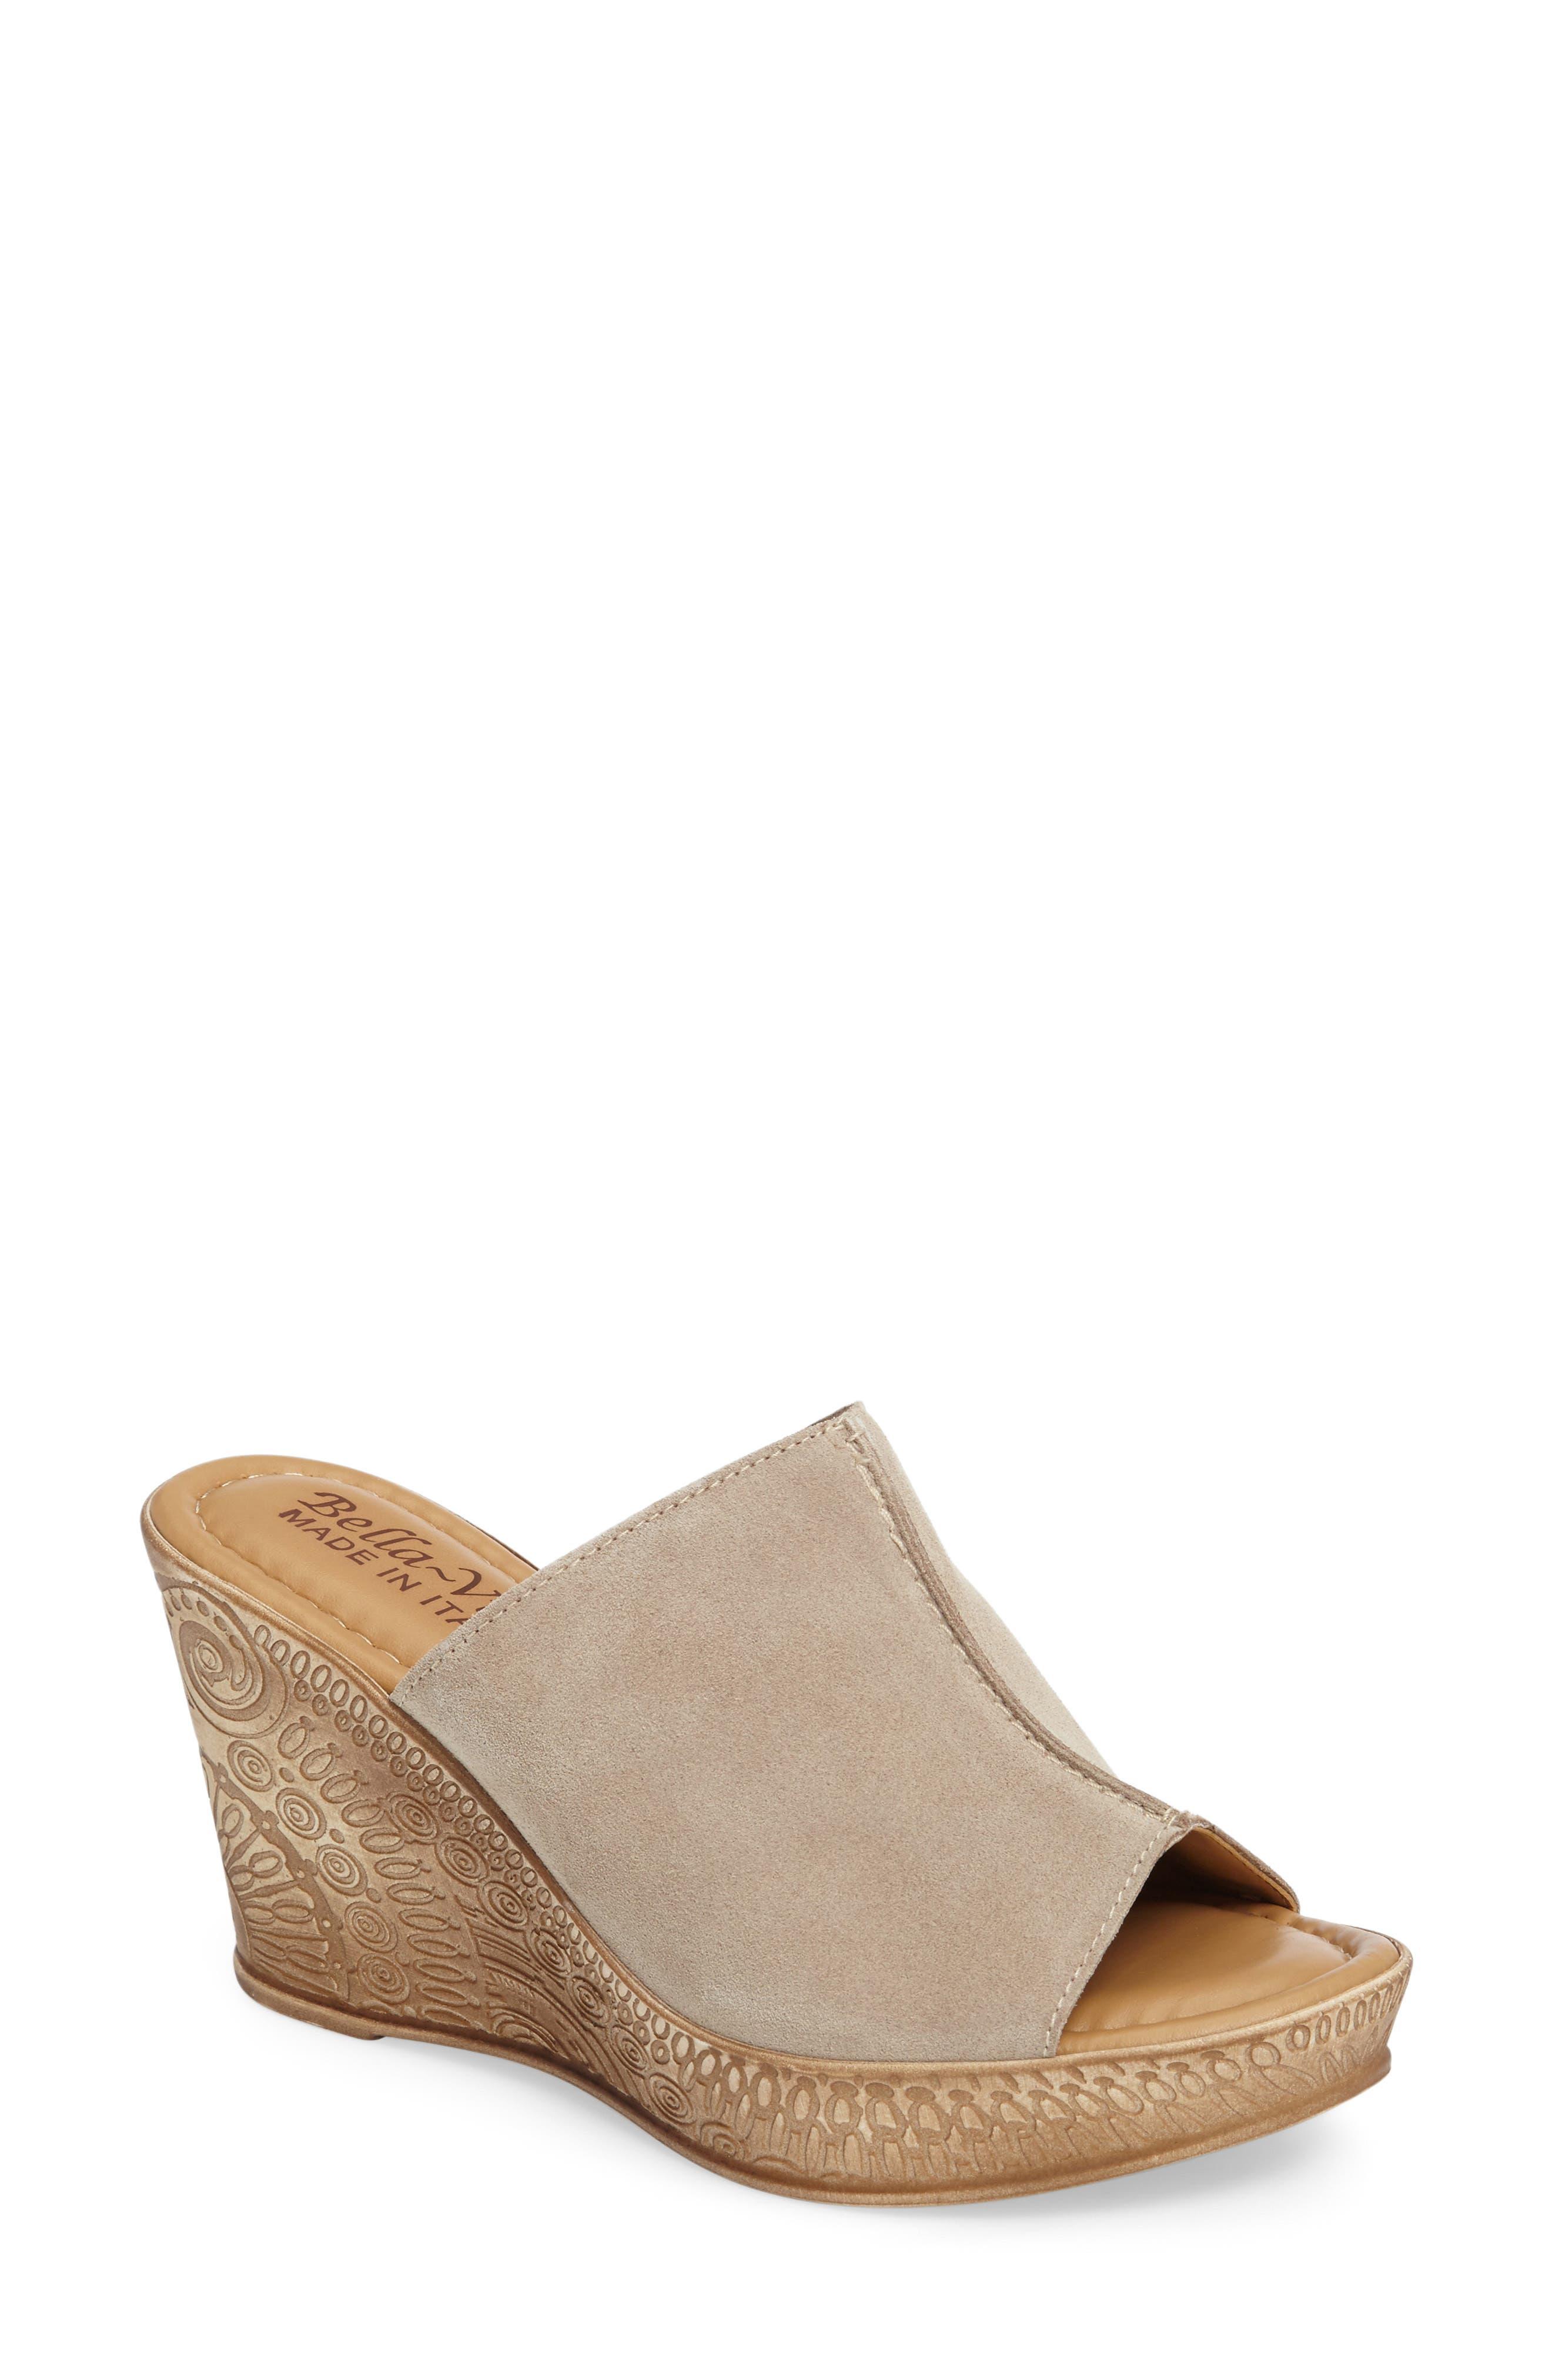 BELLA VITA Wedge Slide Sandal